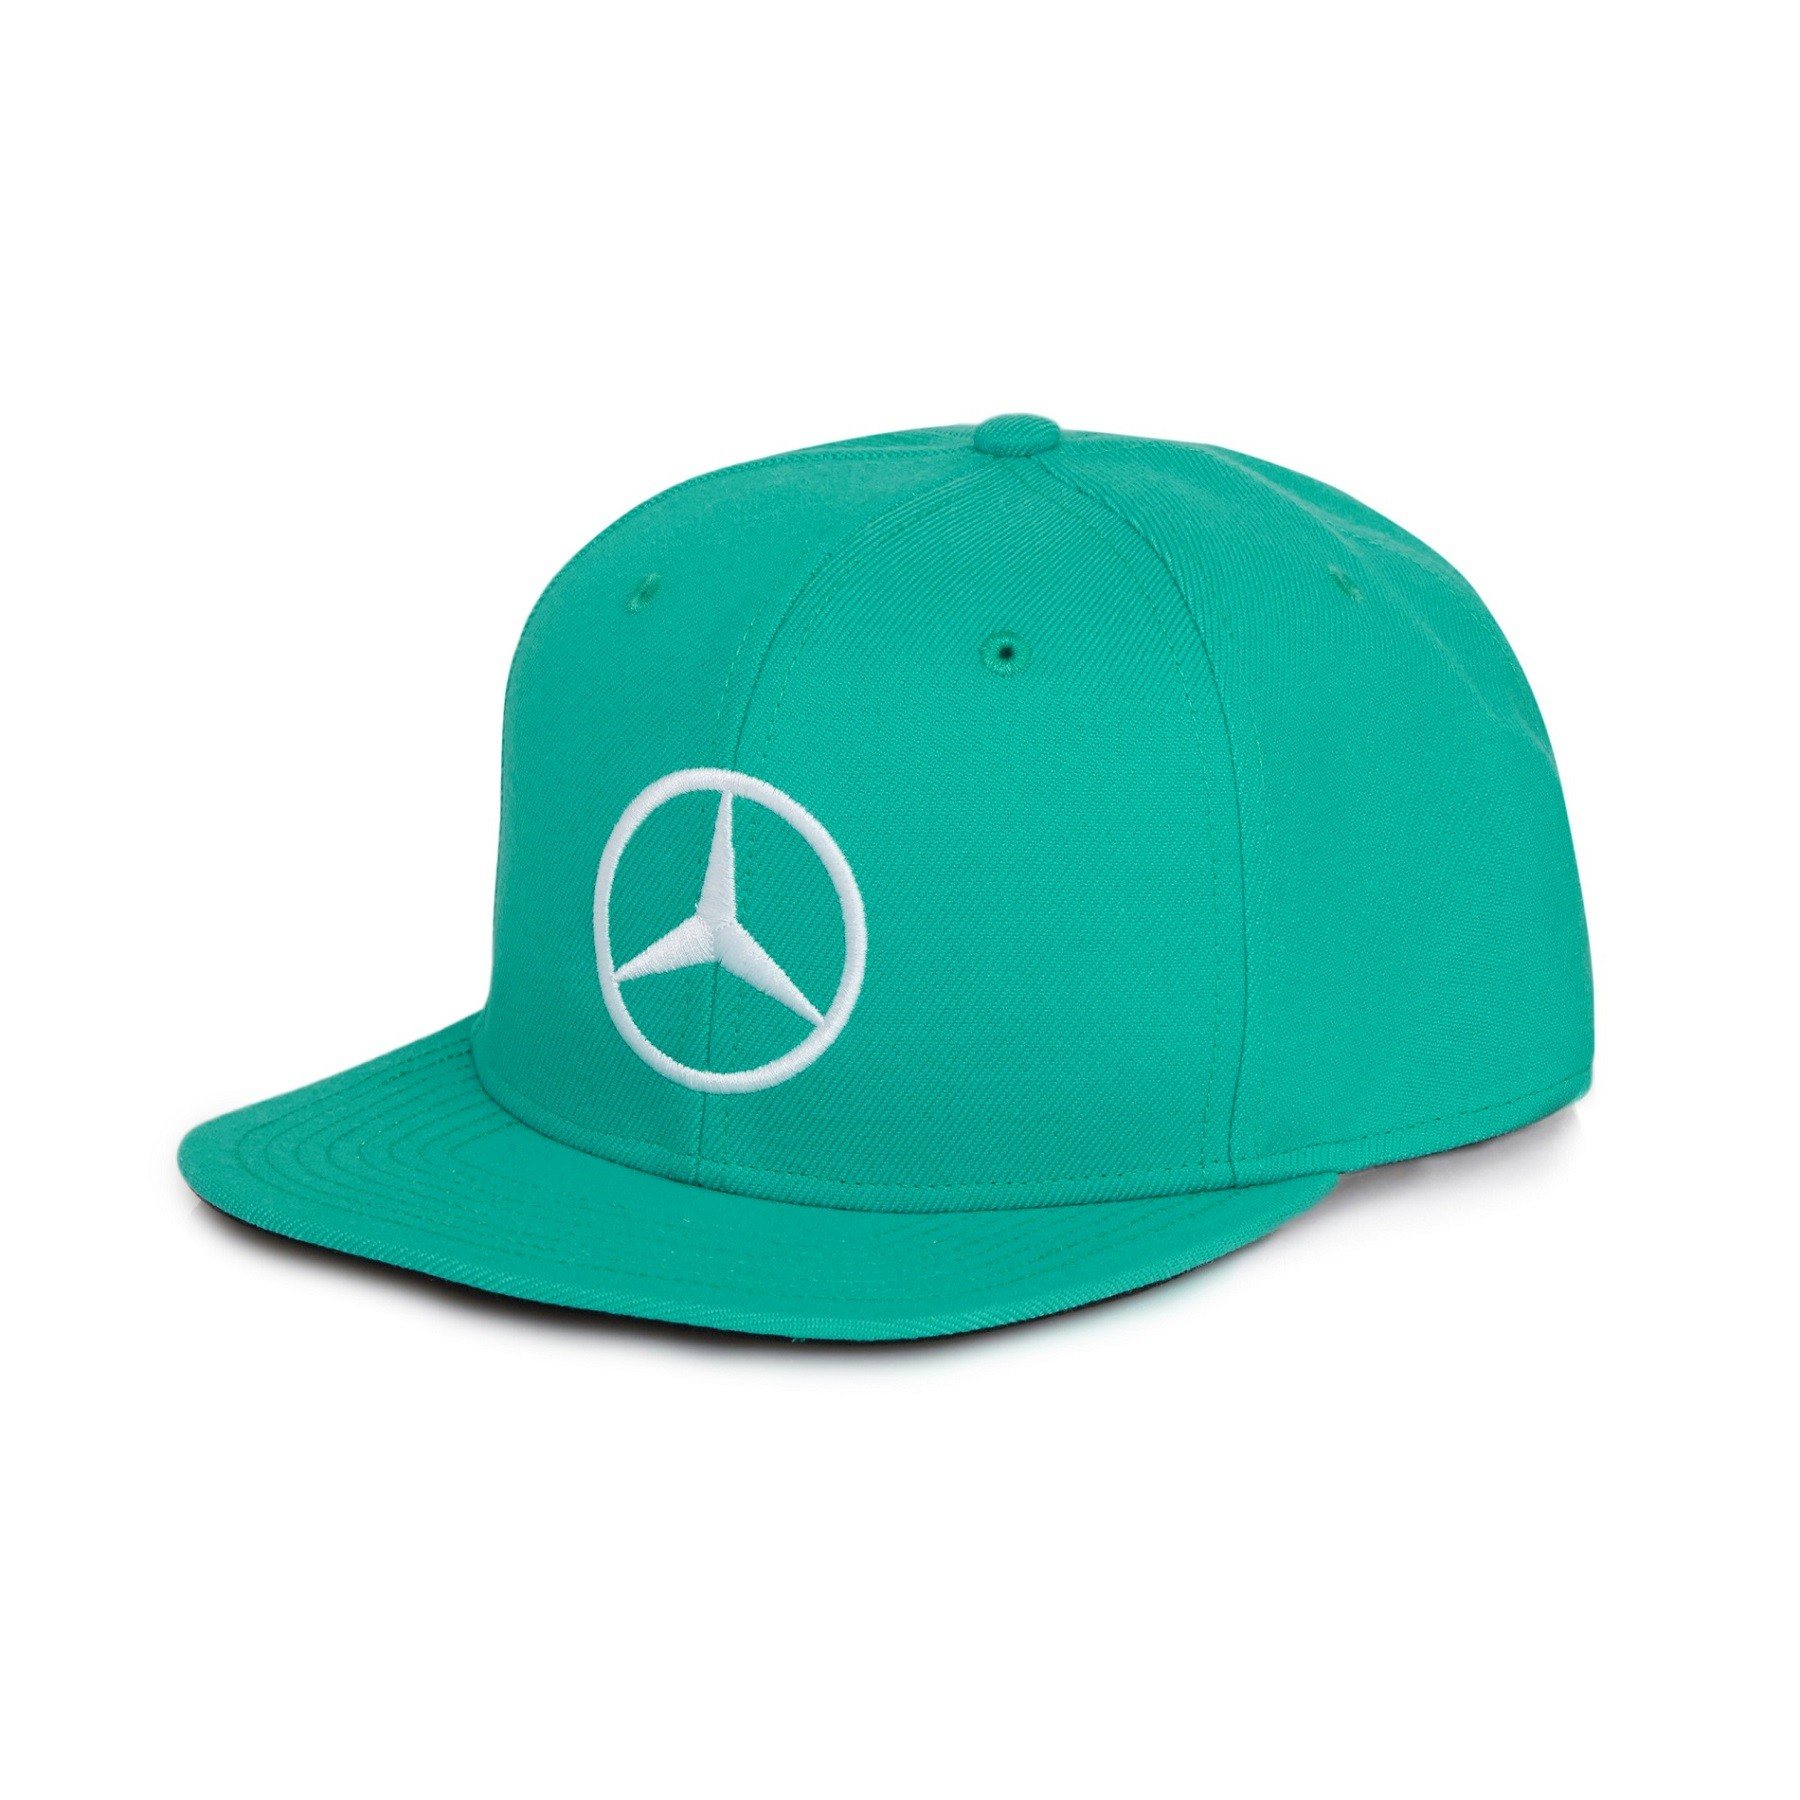 Jordan snapback mercedes for Mercedes benz snapback